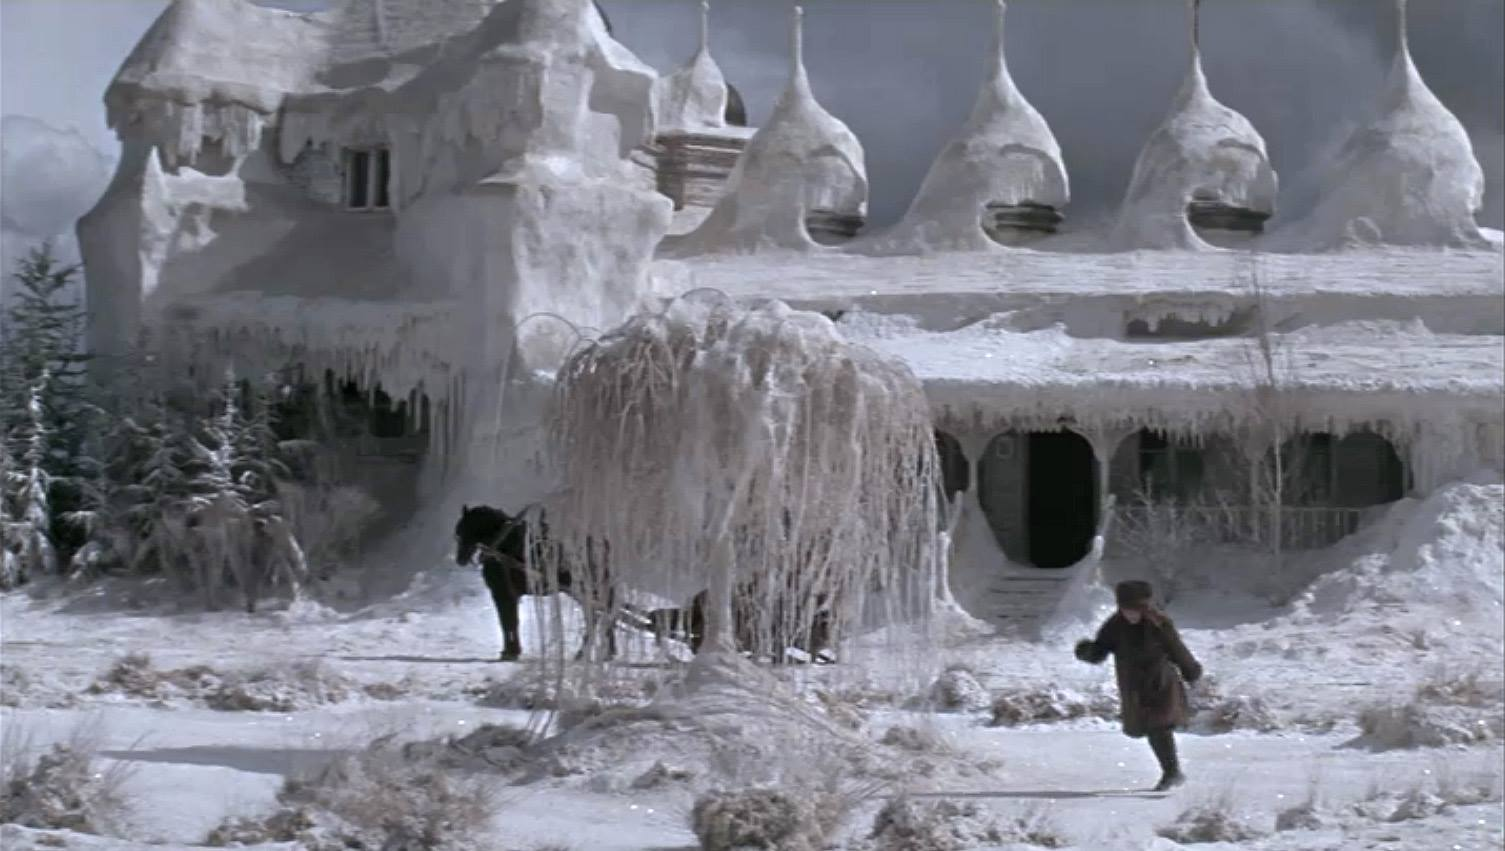 Zhivago-dacha